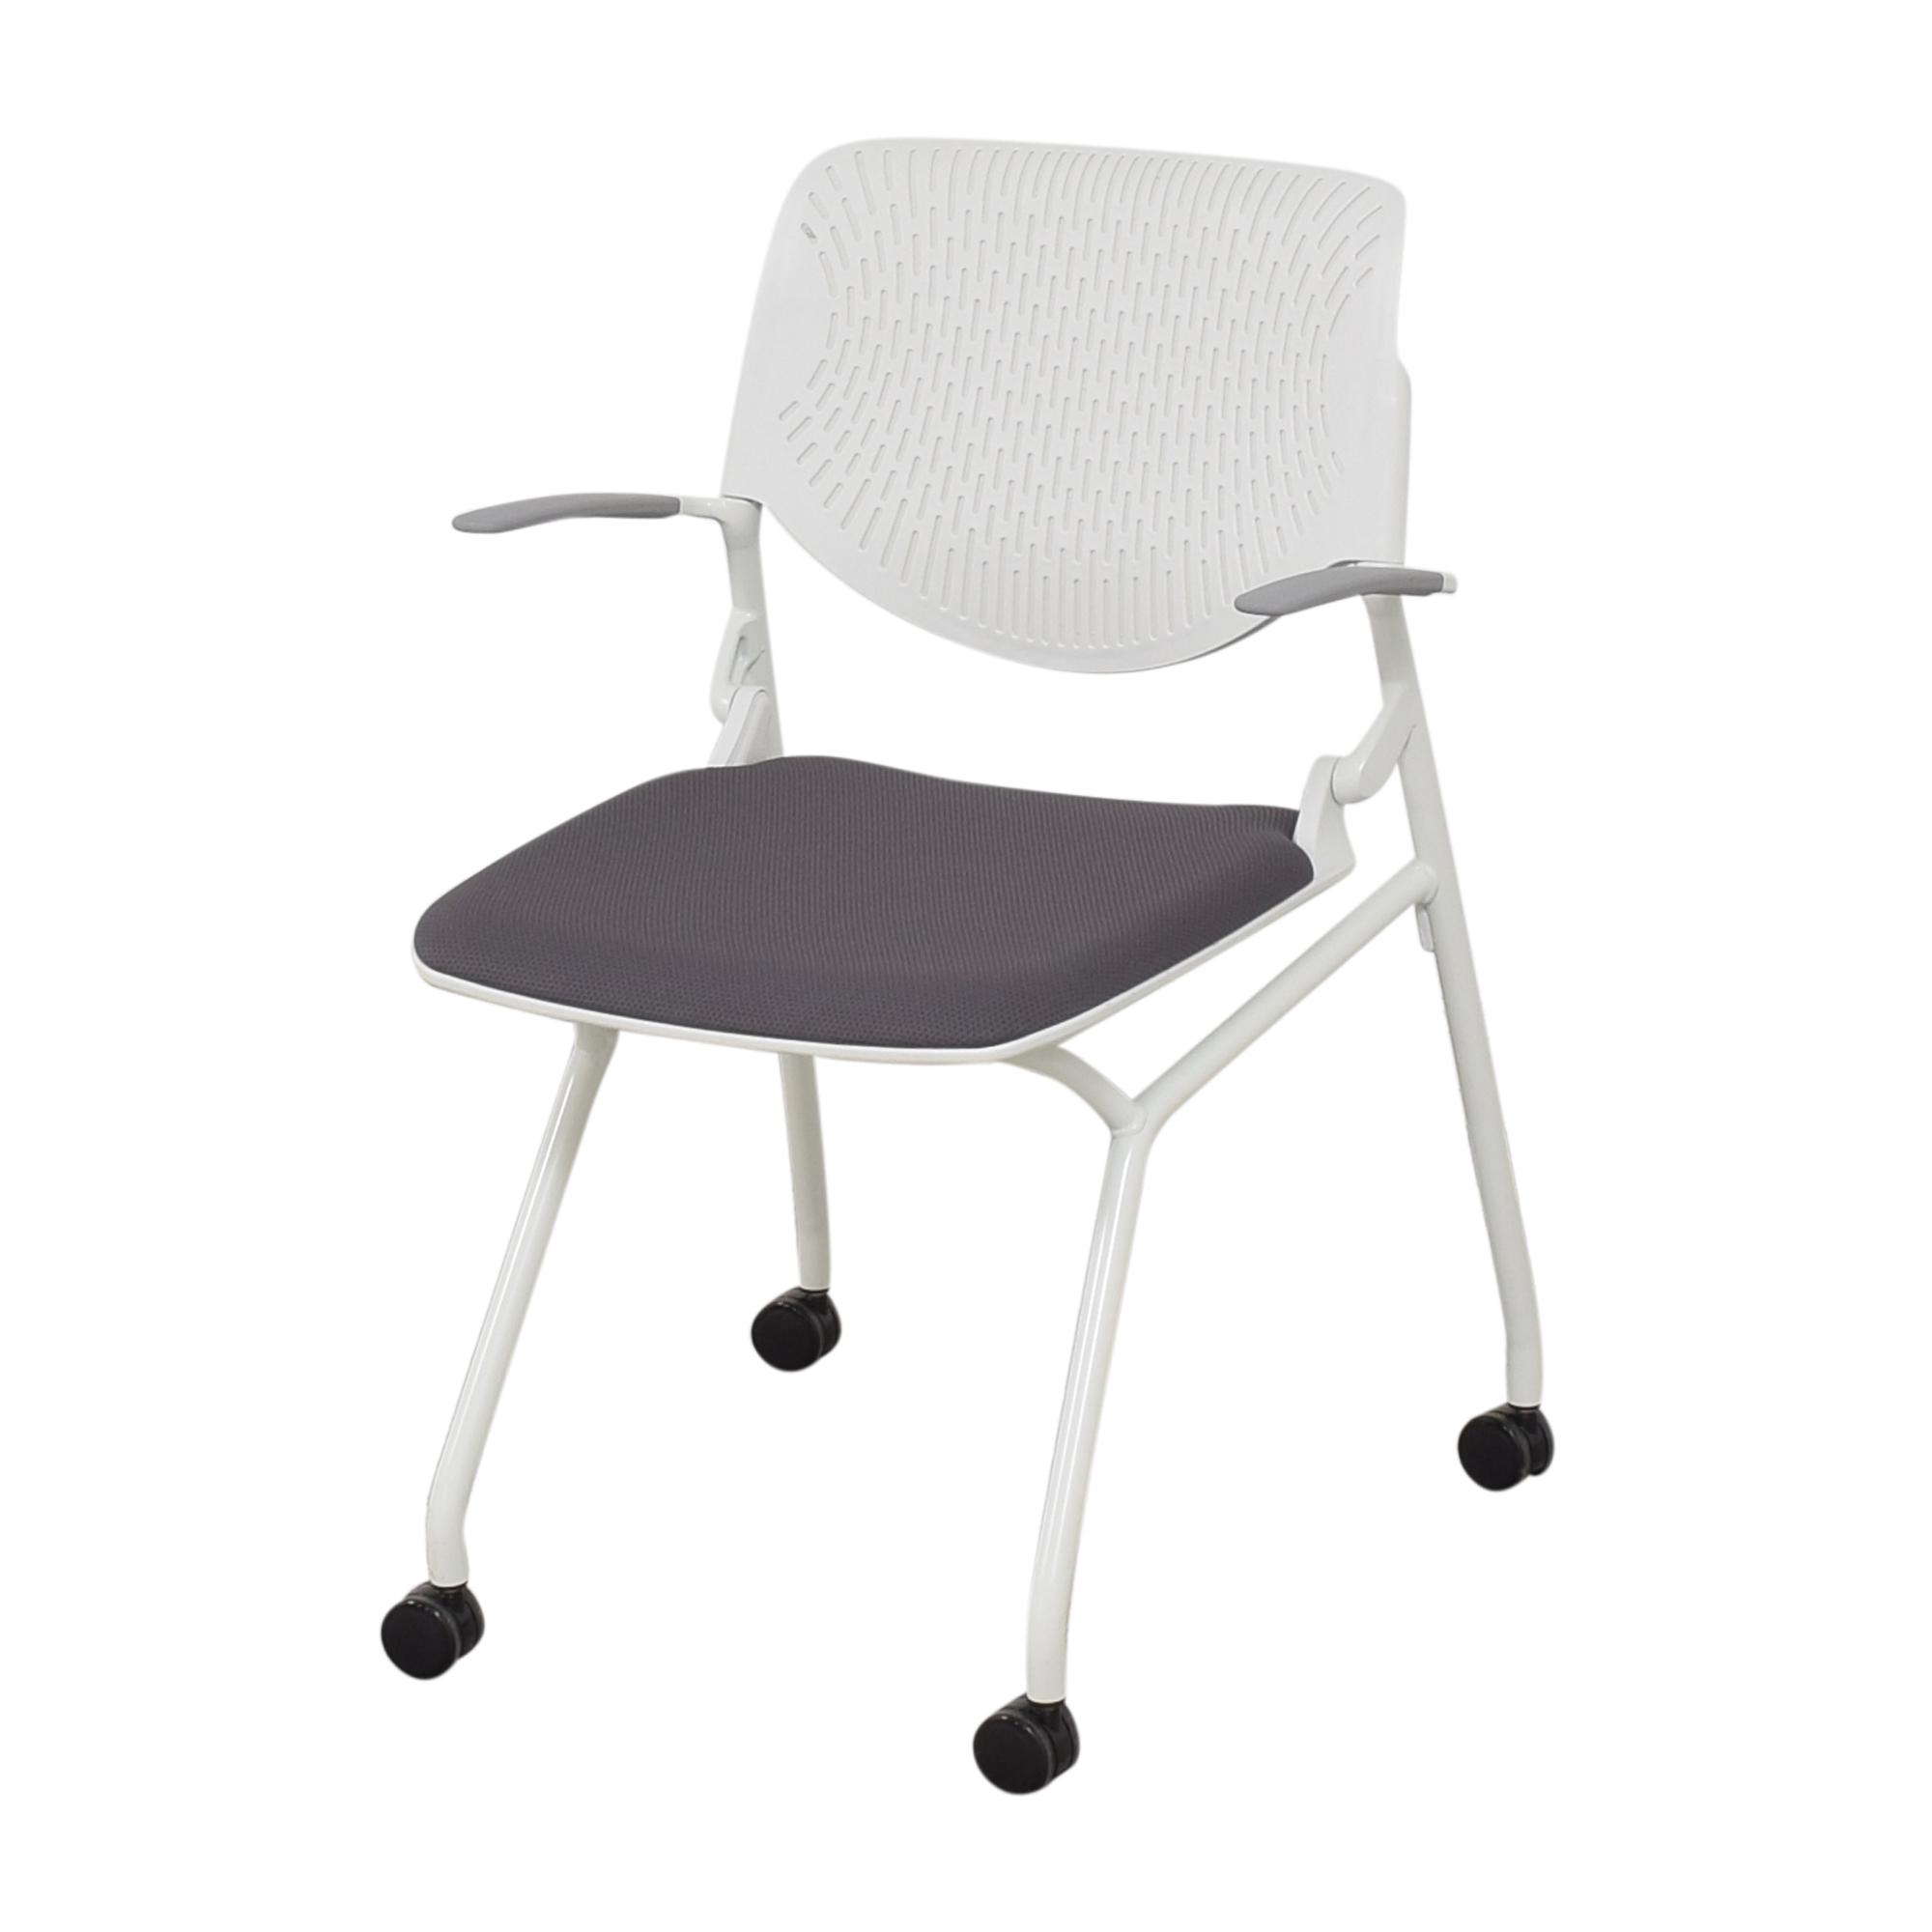 Room & Board Runa Nesting Chair by Okamura sale